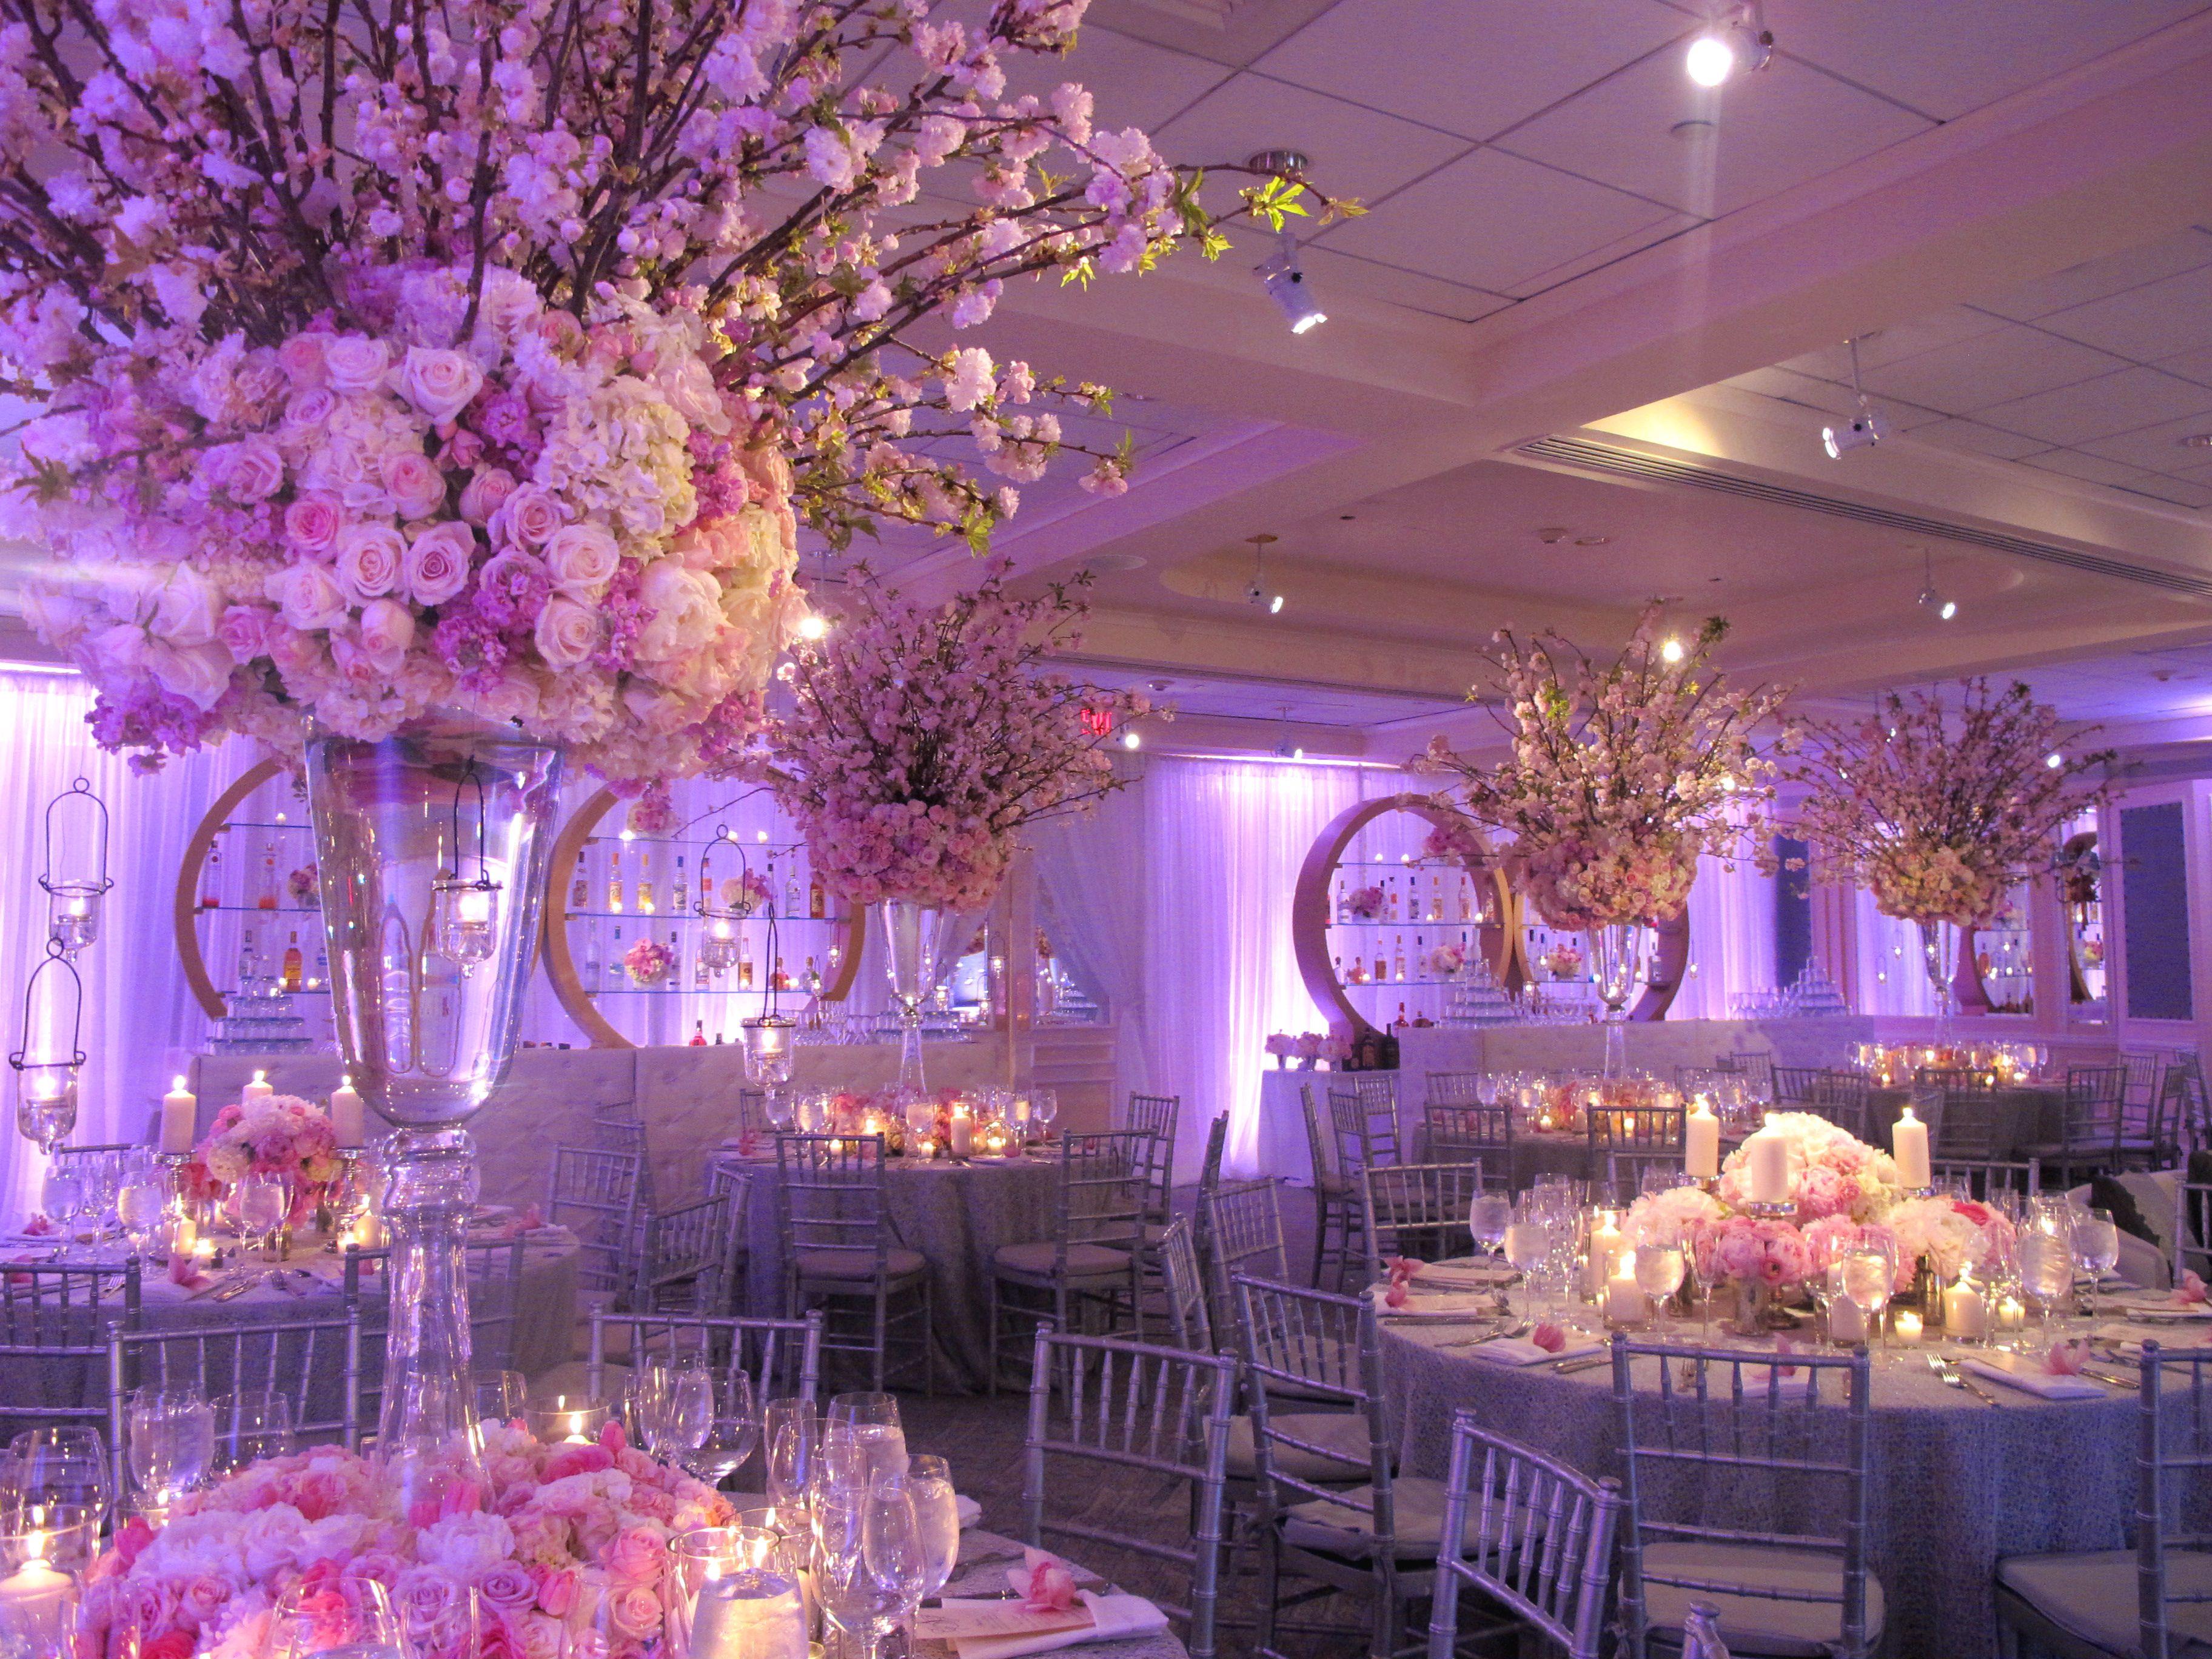 Wedding decoration ideas purple  The tall centerpiece design  Bodas  Pinterest  Centerpieces